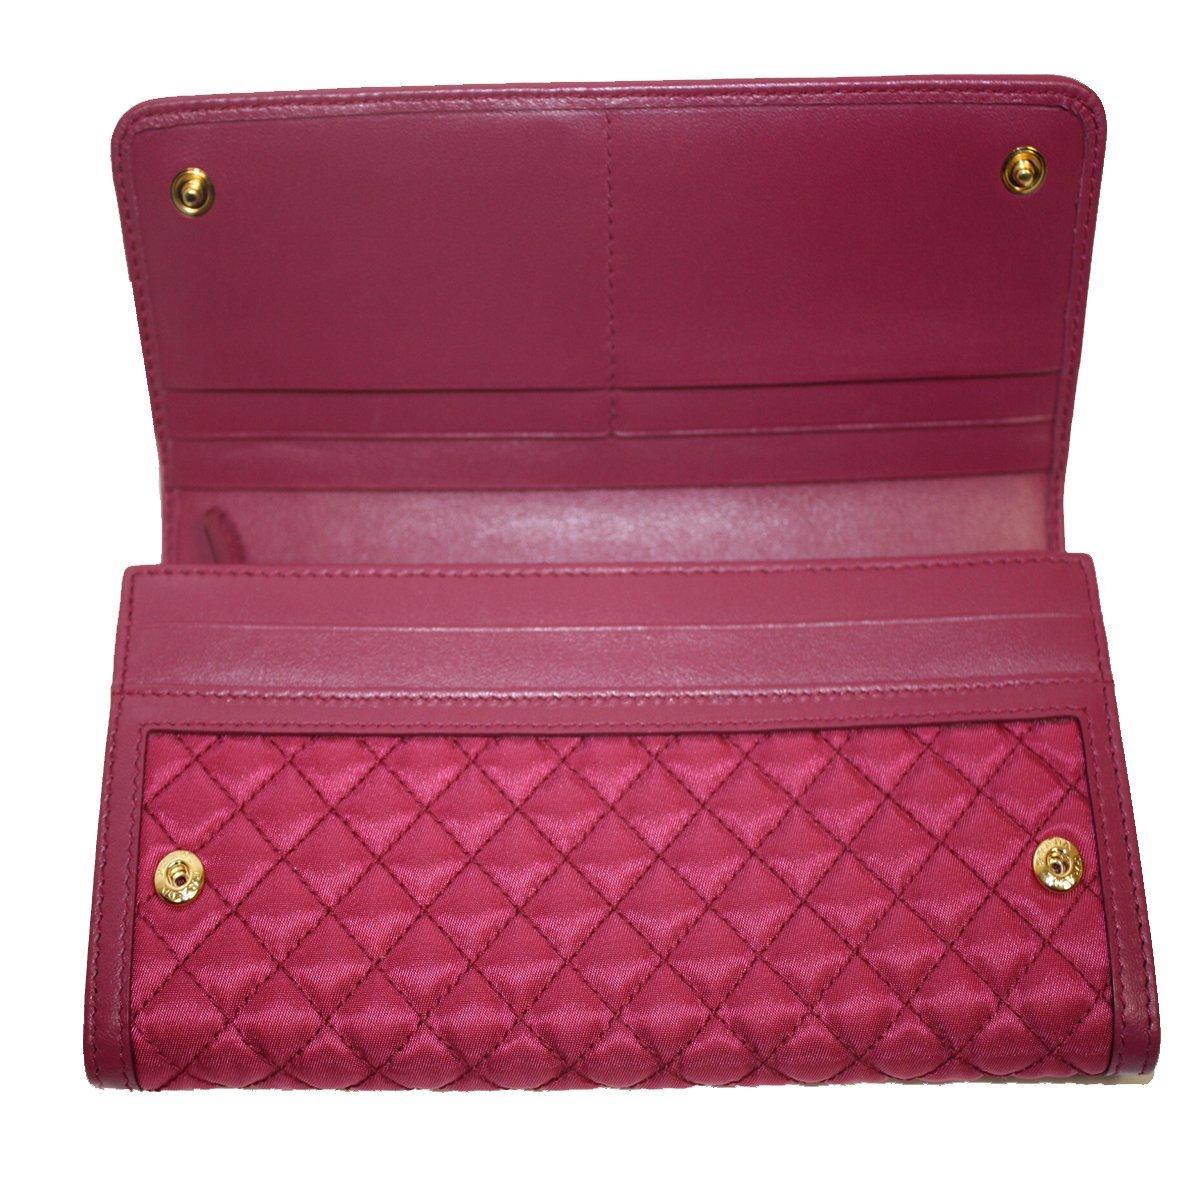 b7fdffd4b175 Prada Tessuto Quilted Nylon Continental Flap Wallet 1M1132